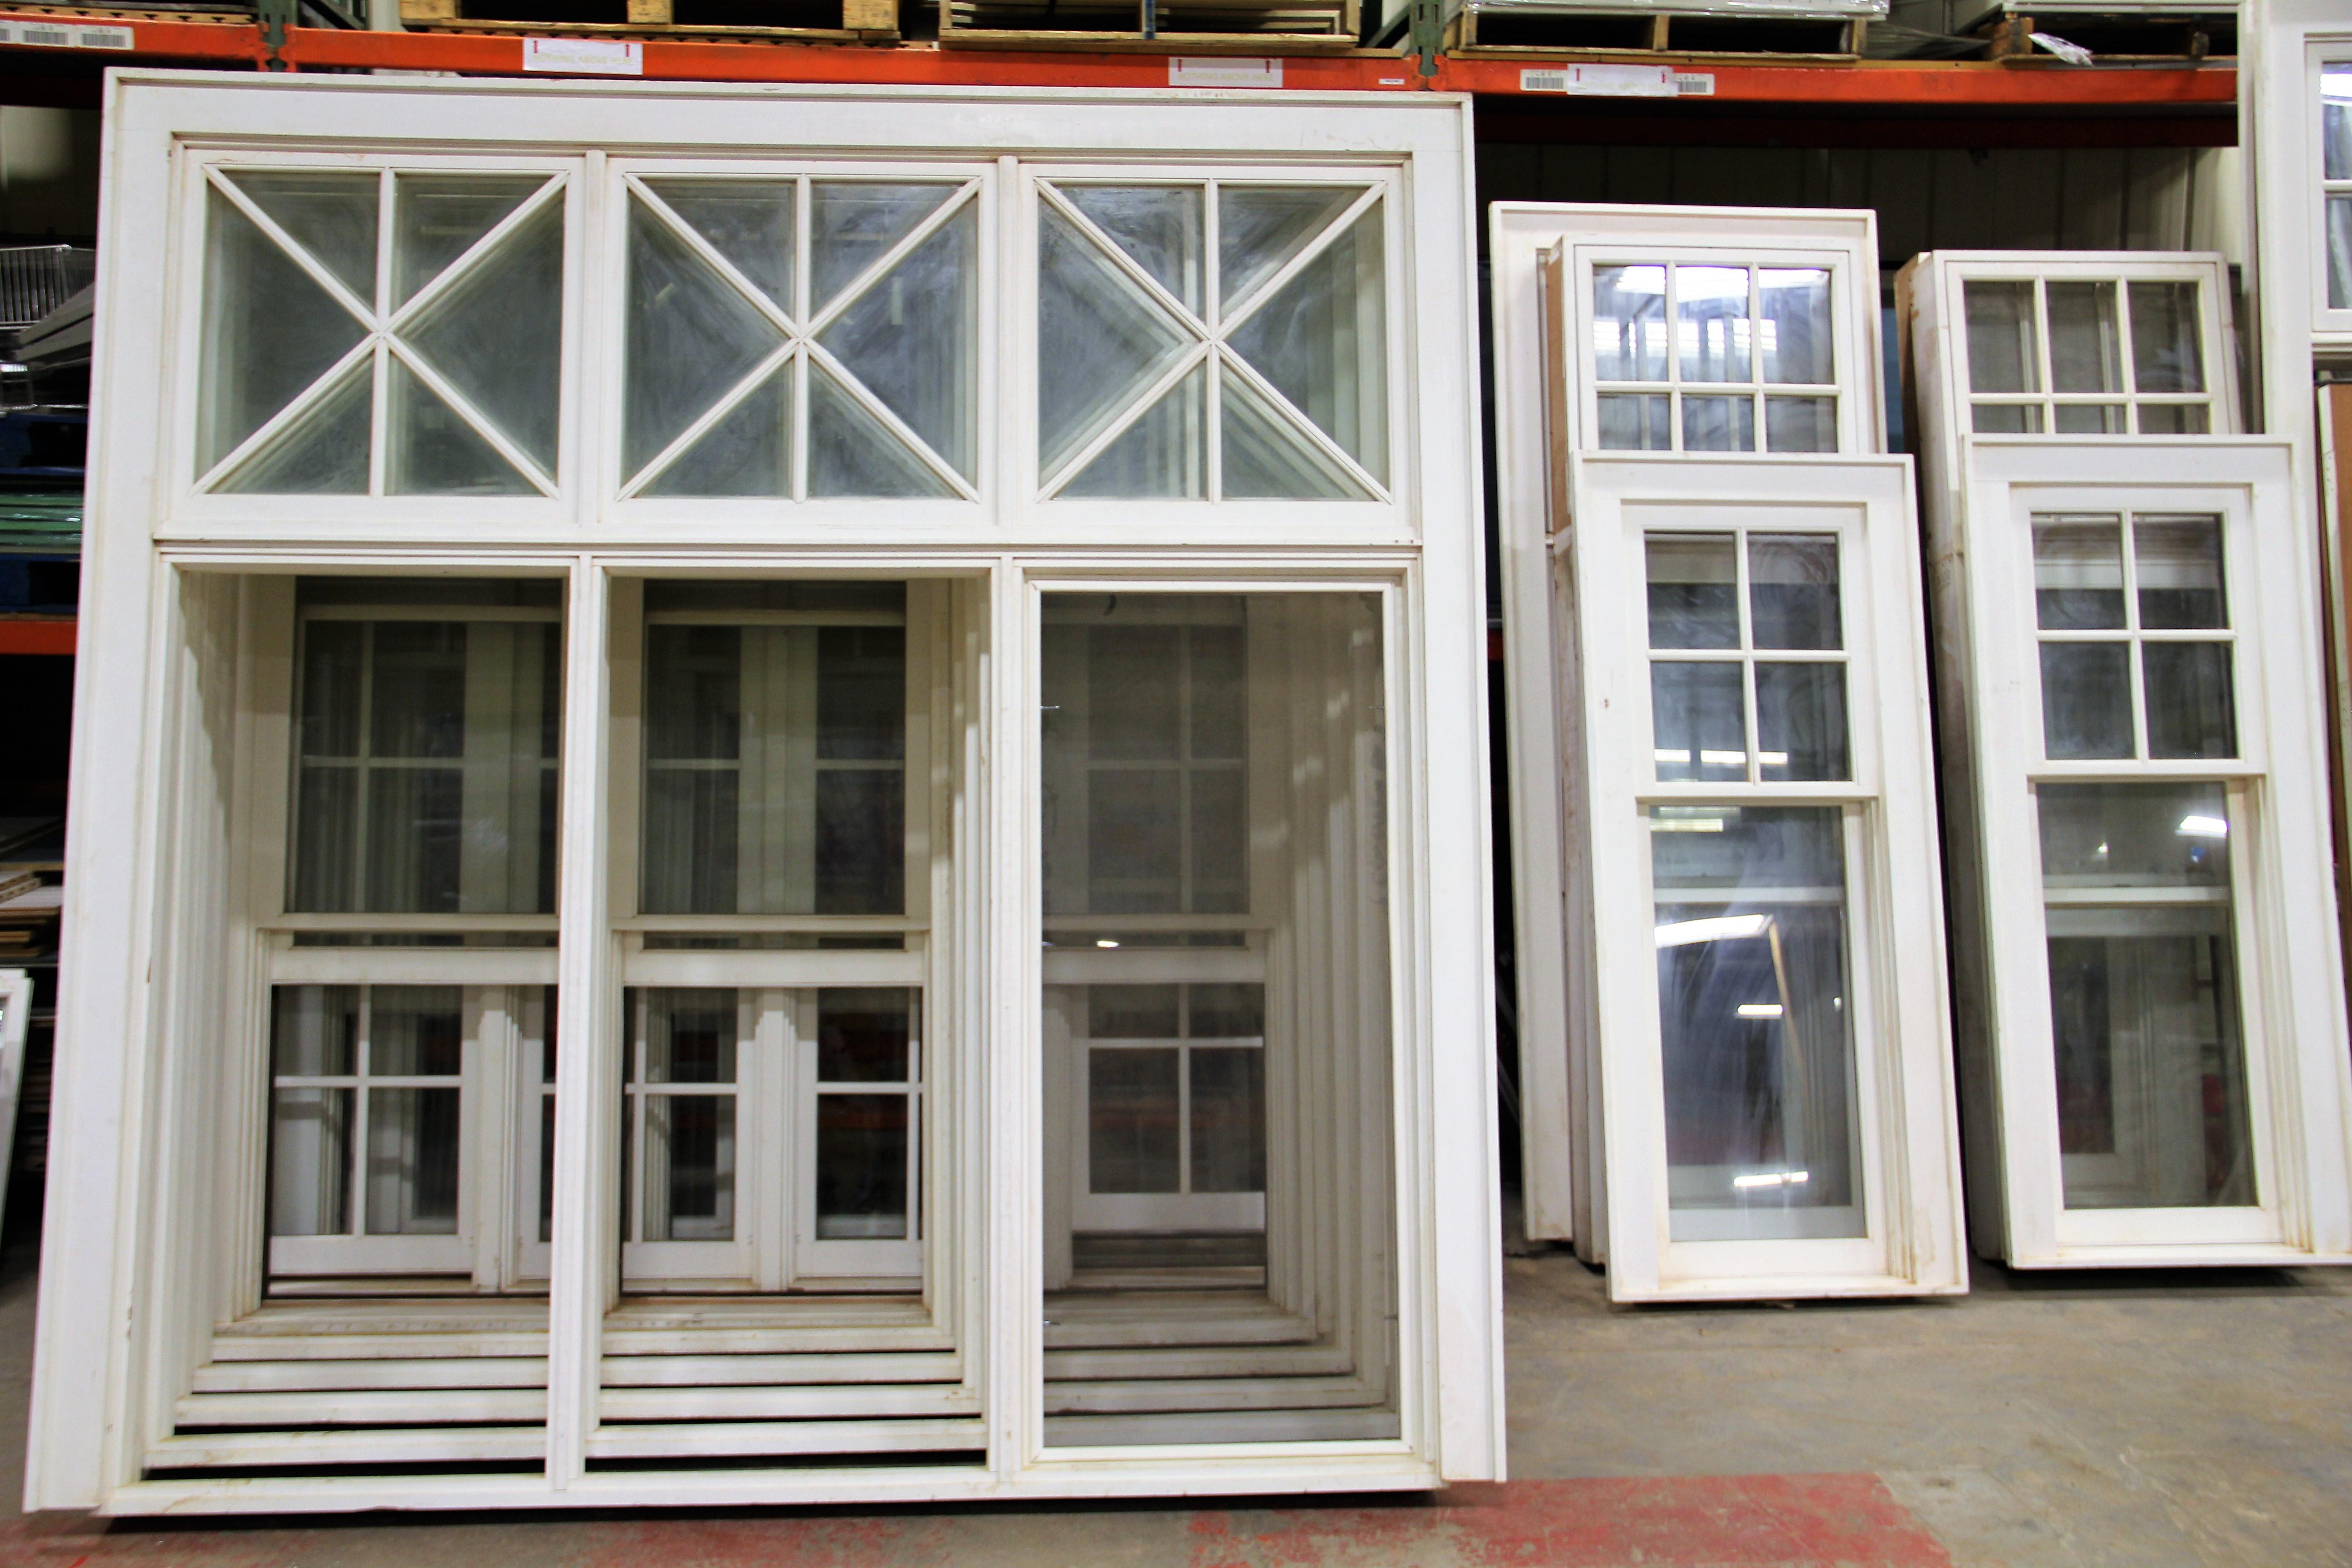 Ross Windows Amp Doors And Elemental Architecture Partner